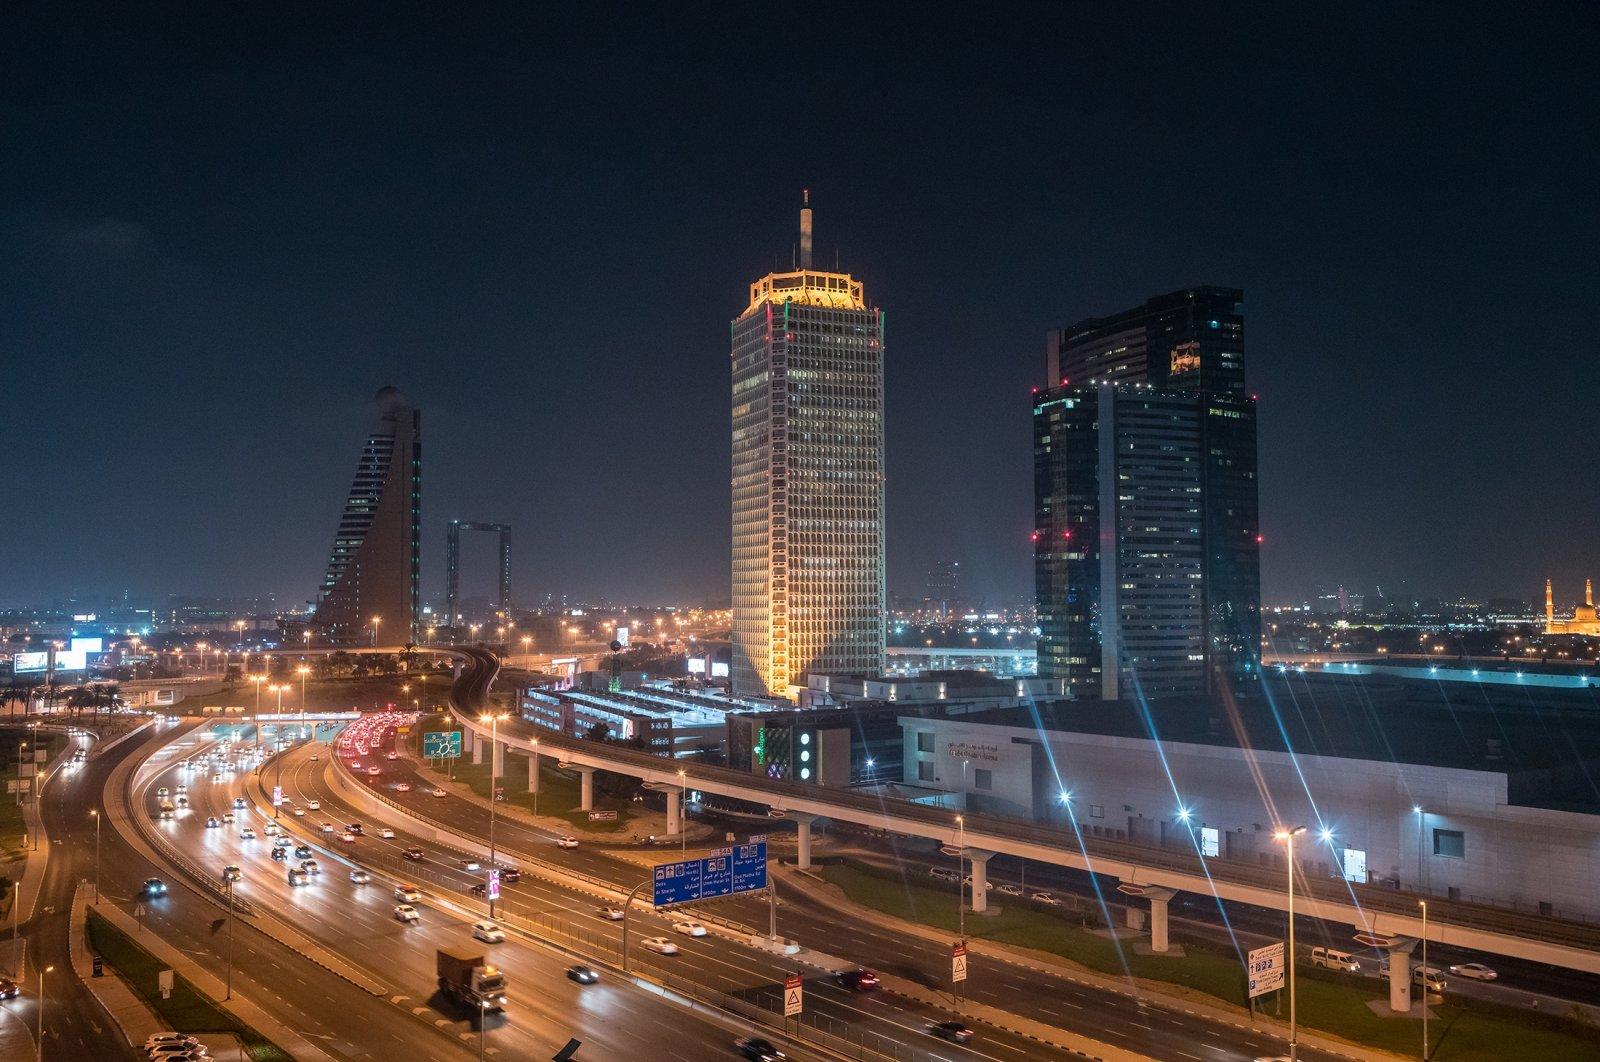 World Trade Centre and Sheikh Zayed Road, Dubai, UAE, Oct. 5, 2017. (Shutterstock Photo)